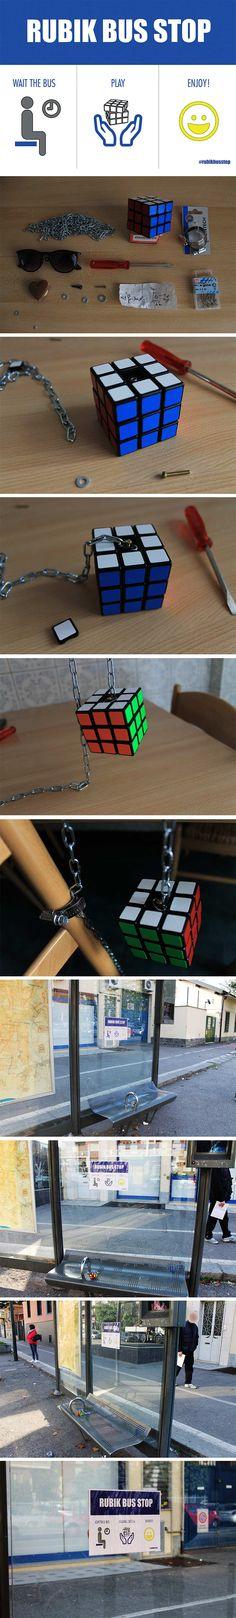 Bushaltestelle mit Rubik's Cube https://www.langweiledich.net/bushaltestelle-mit-rubiks-cube/